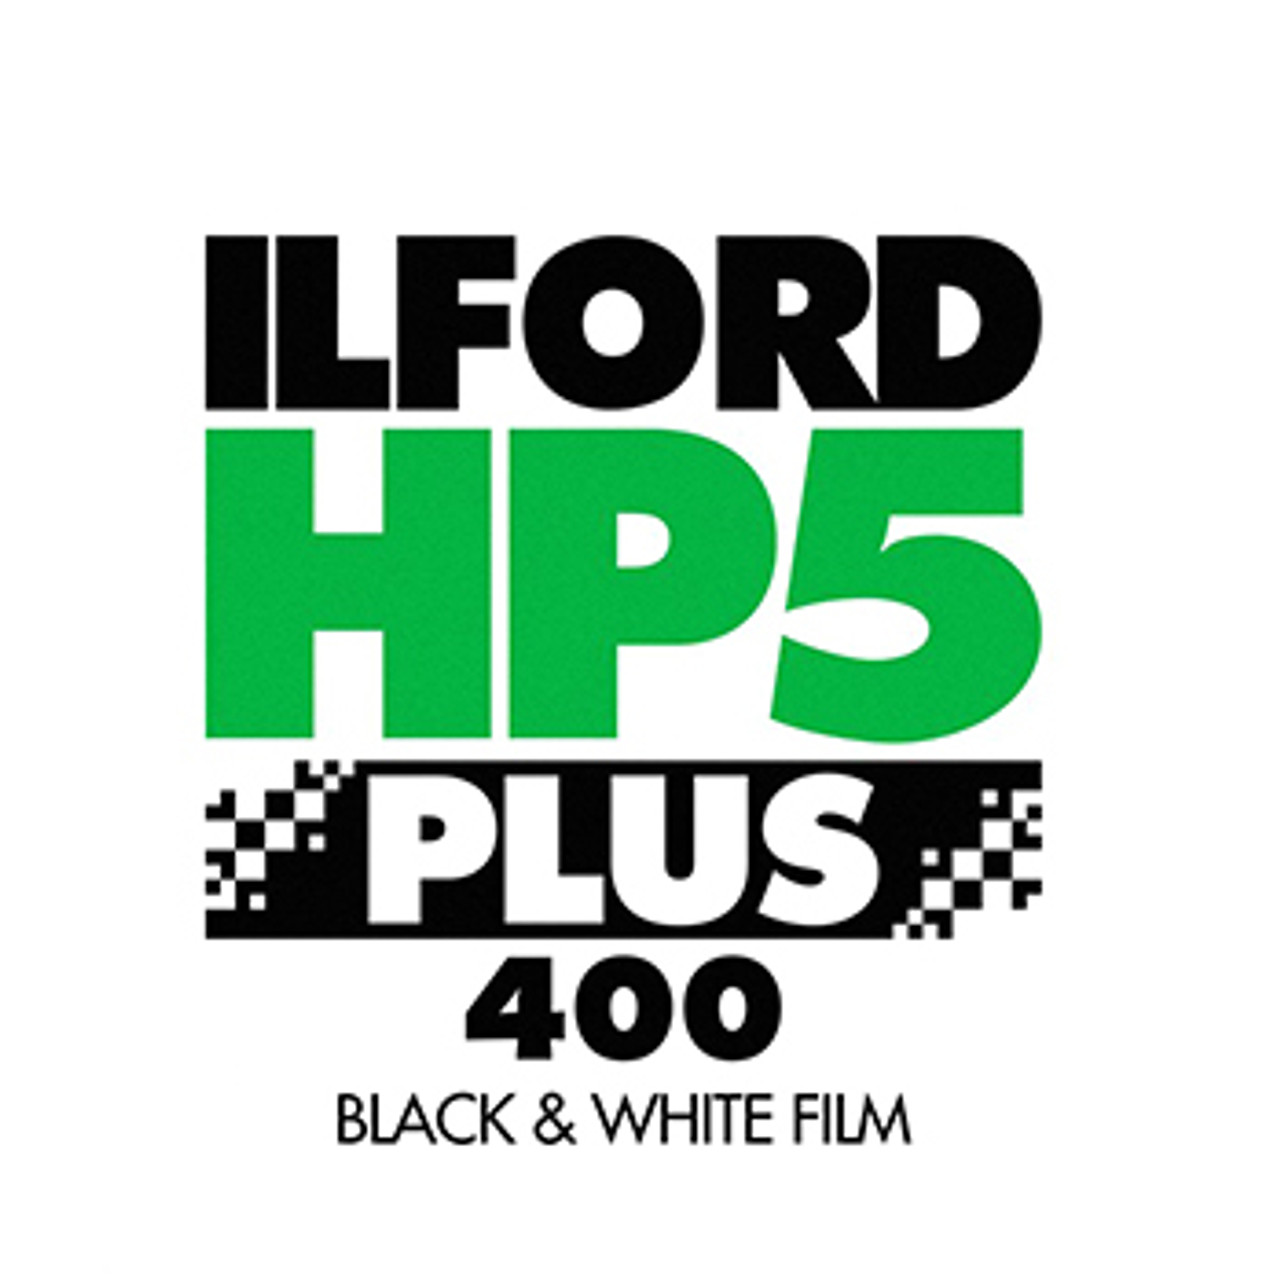 ILFORD HP5 35MM BLACK & WHITE FILM 100' ROLL